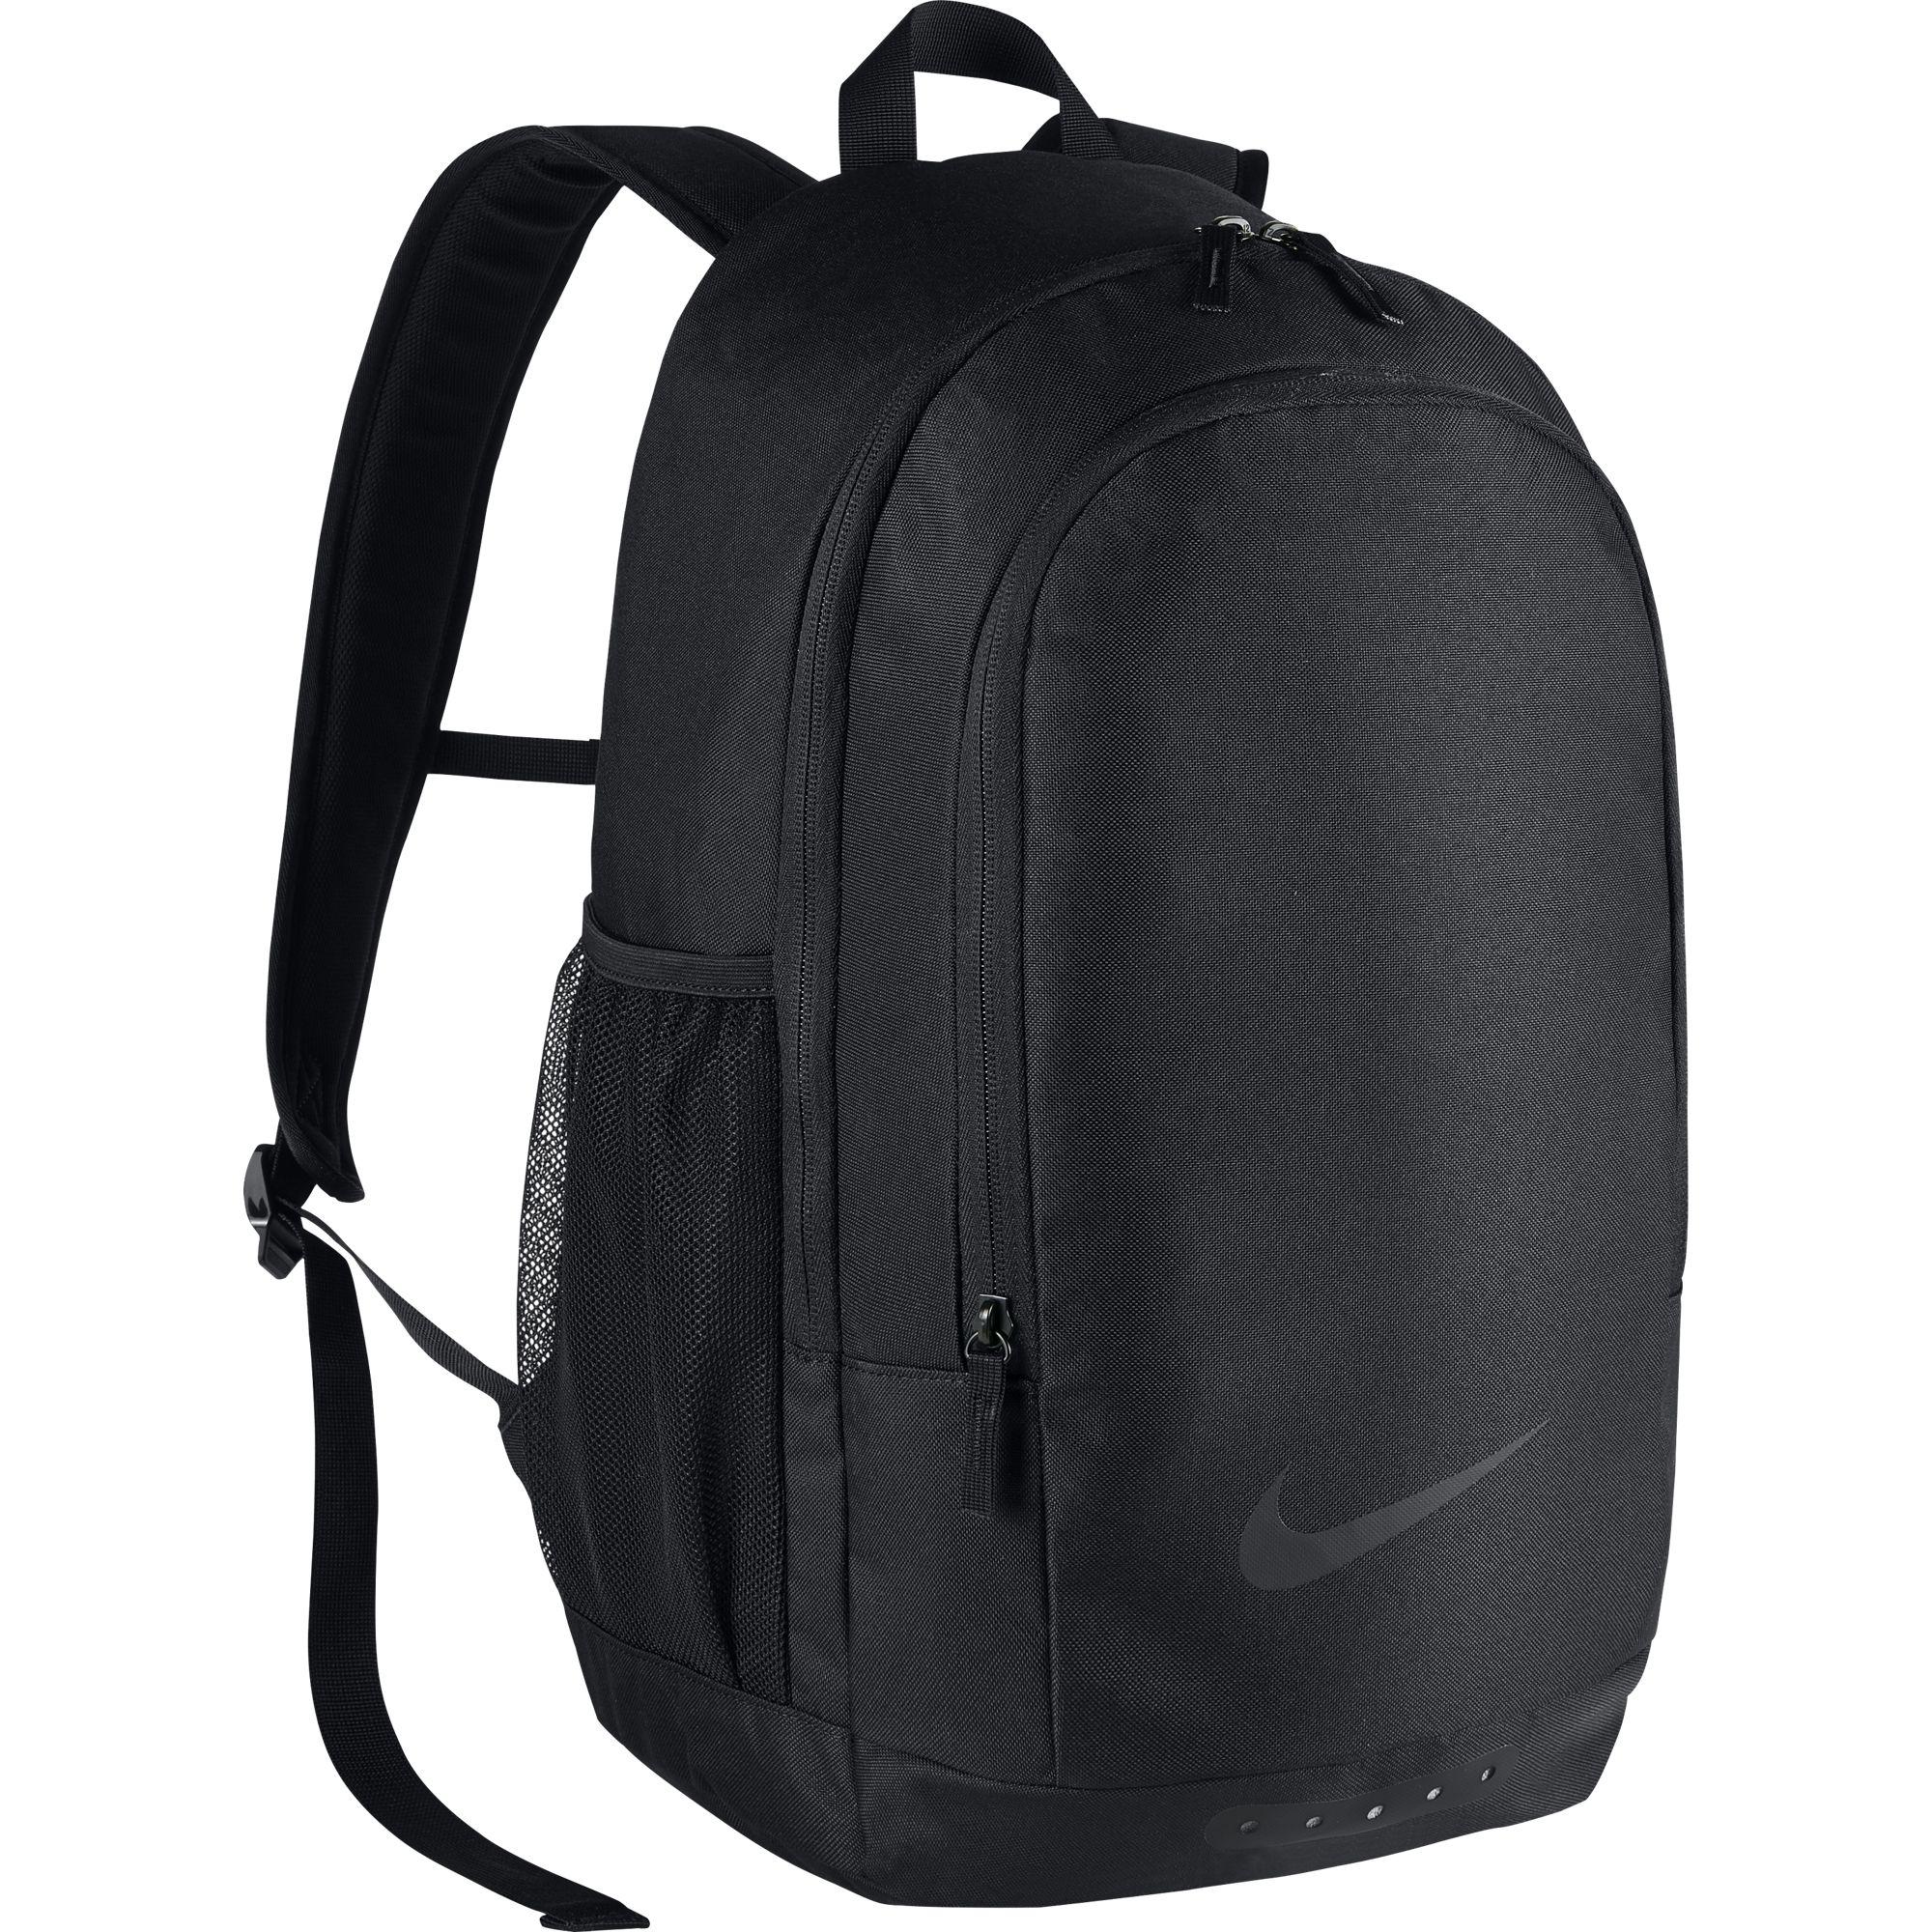 b2ca3c064b82 Nike Academy Football Backpack Black Anthracite 883419369148